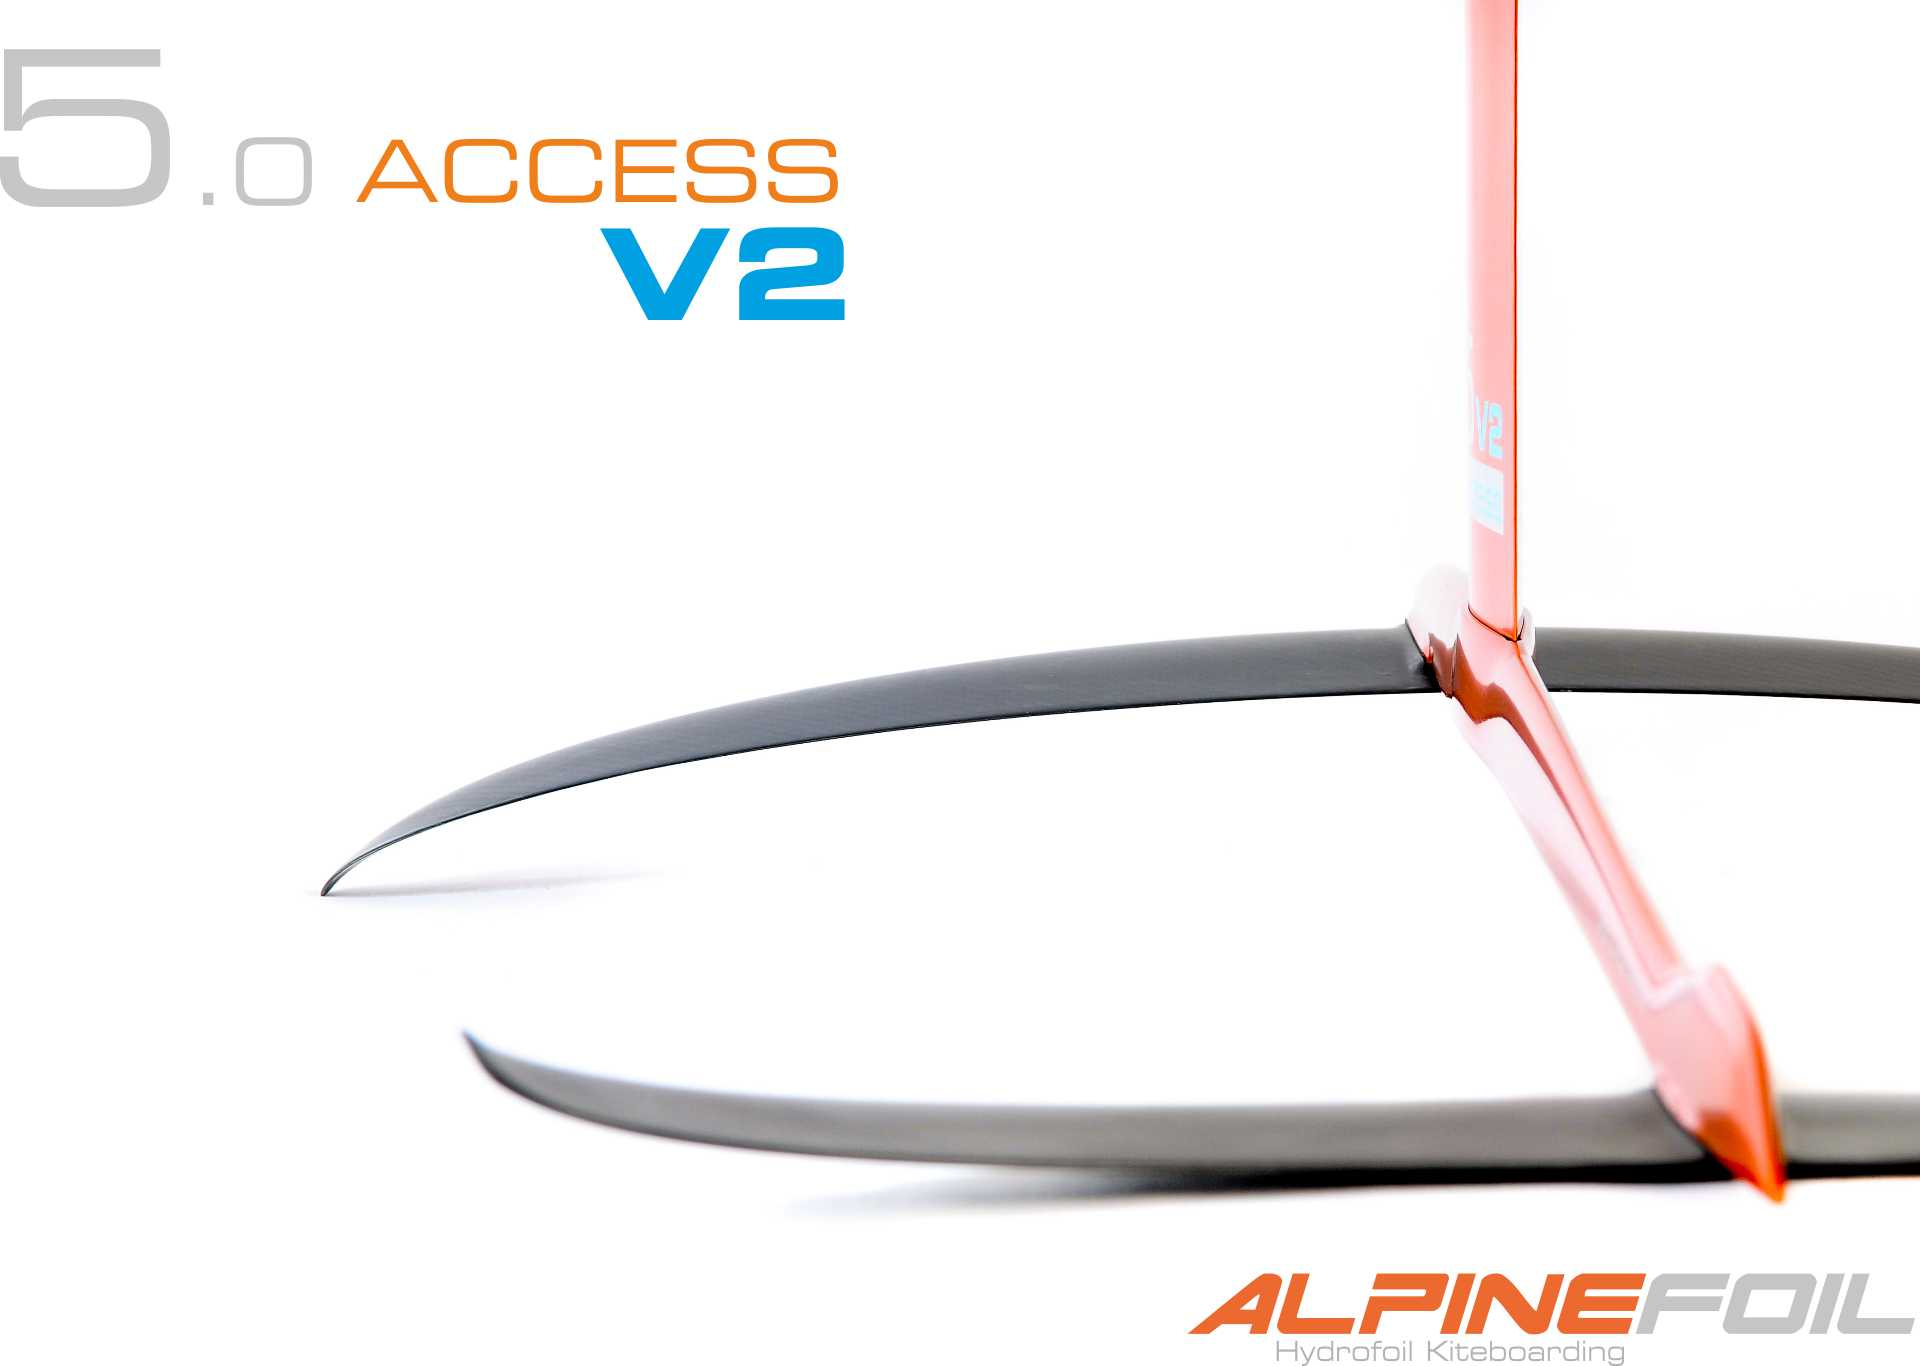 Kitefoil carbon aluminium access 5 0 v2 2